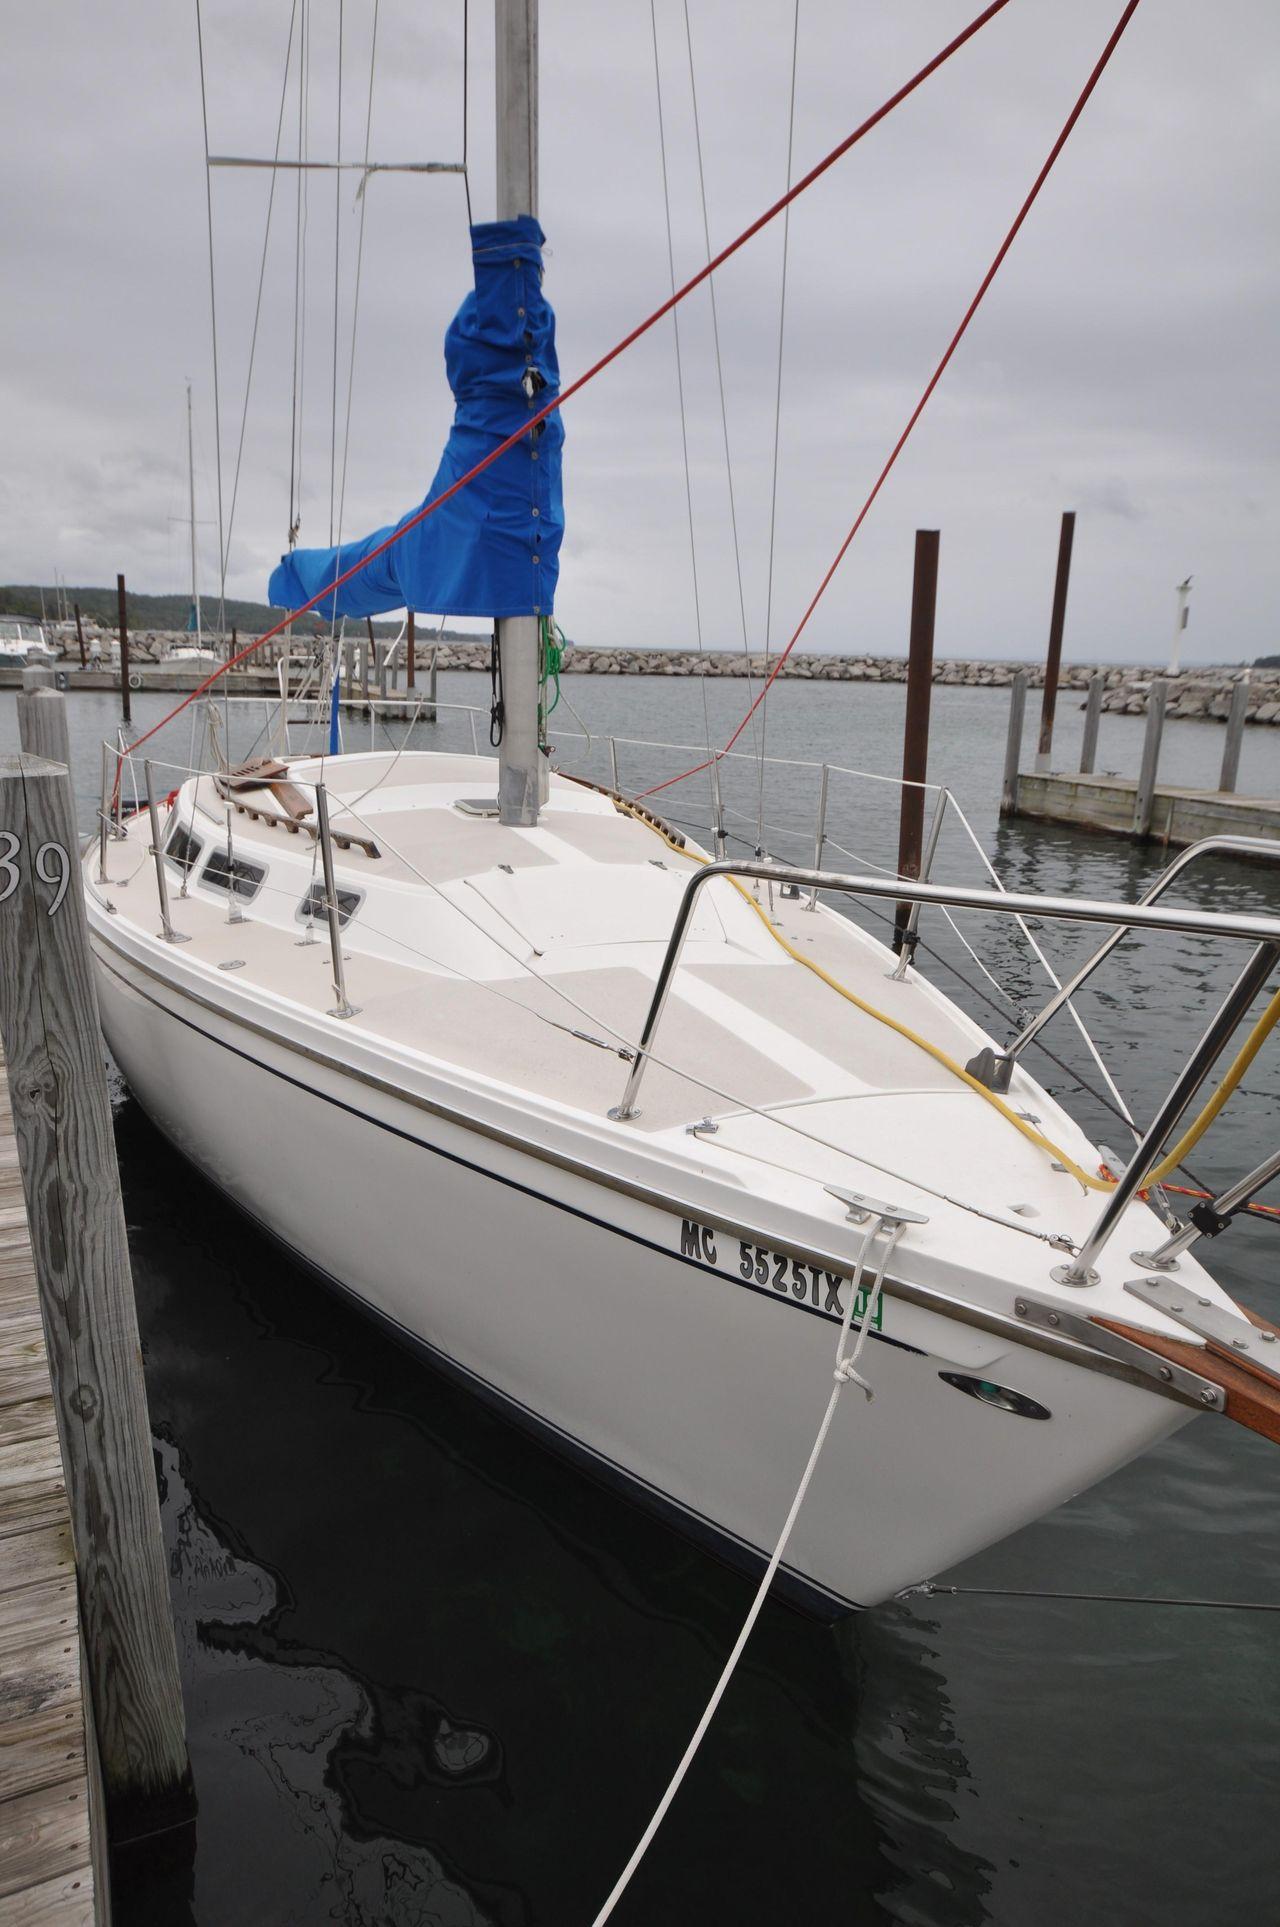 1980 Used Catalina 30 Tall Rig Racer and Cruiser Sailboat